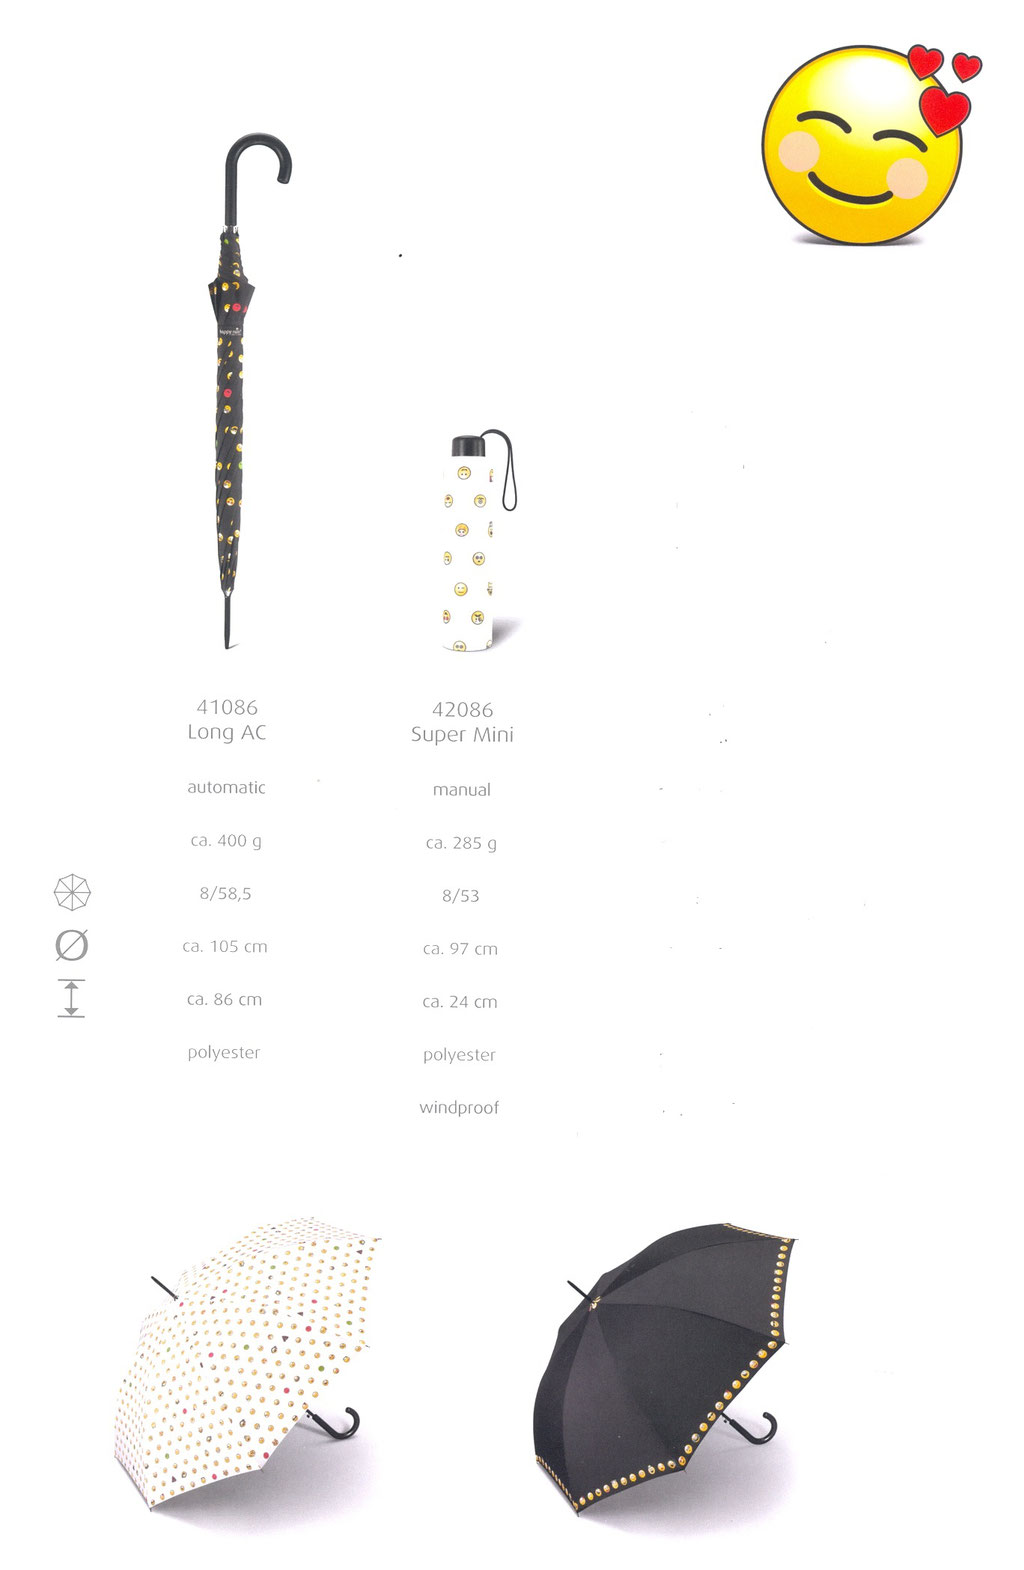 Essentials Emoticon 41086 Long 42086 Super Mini